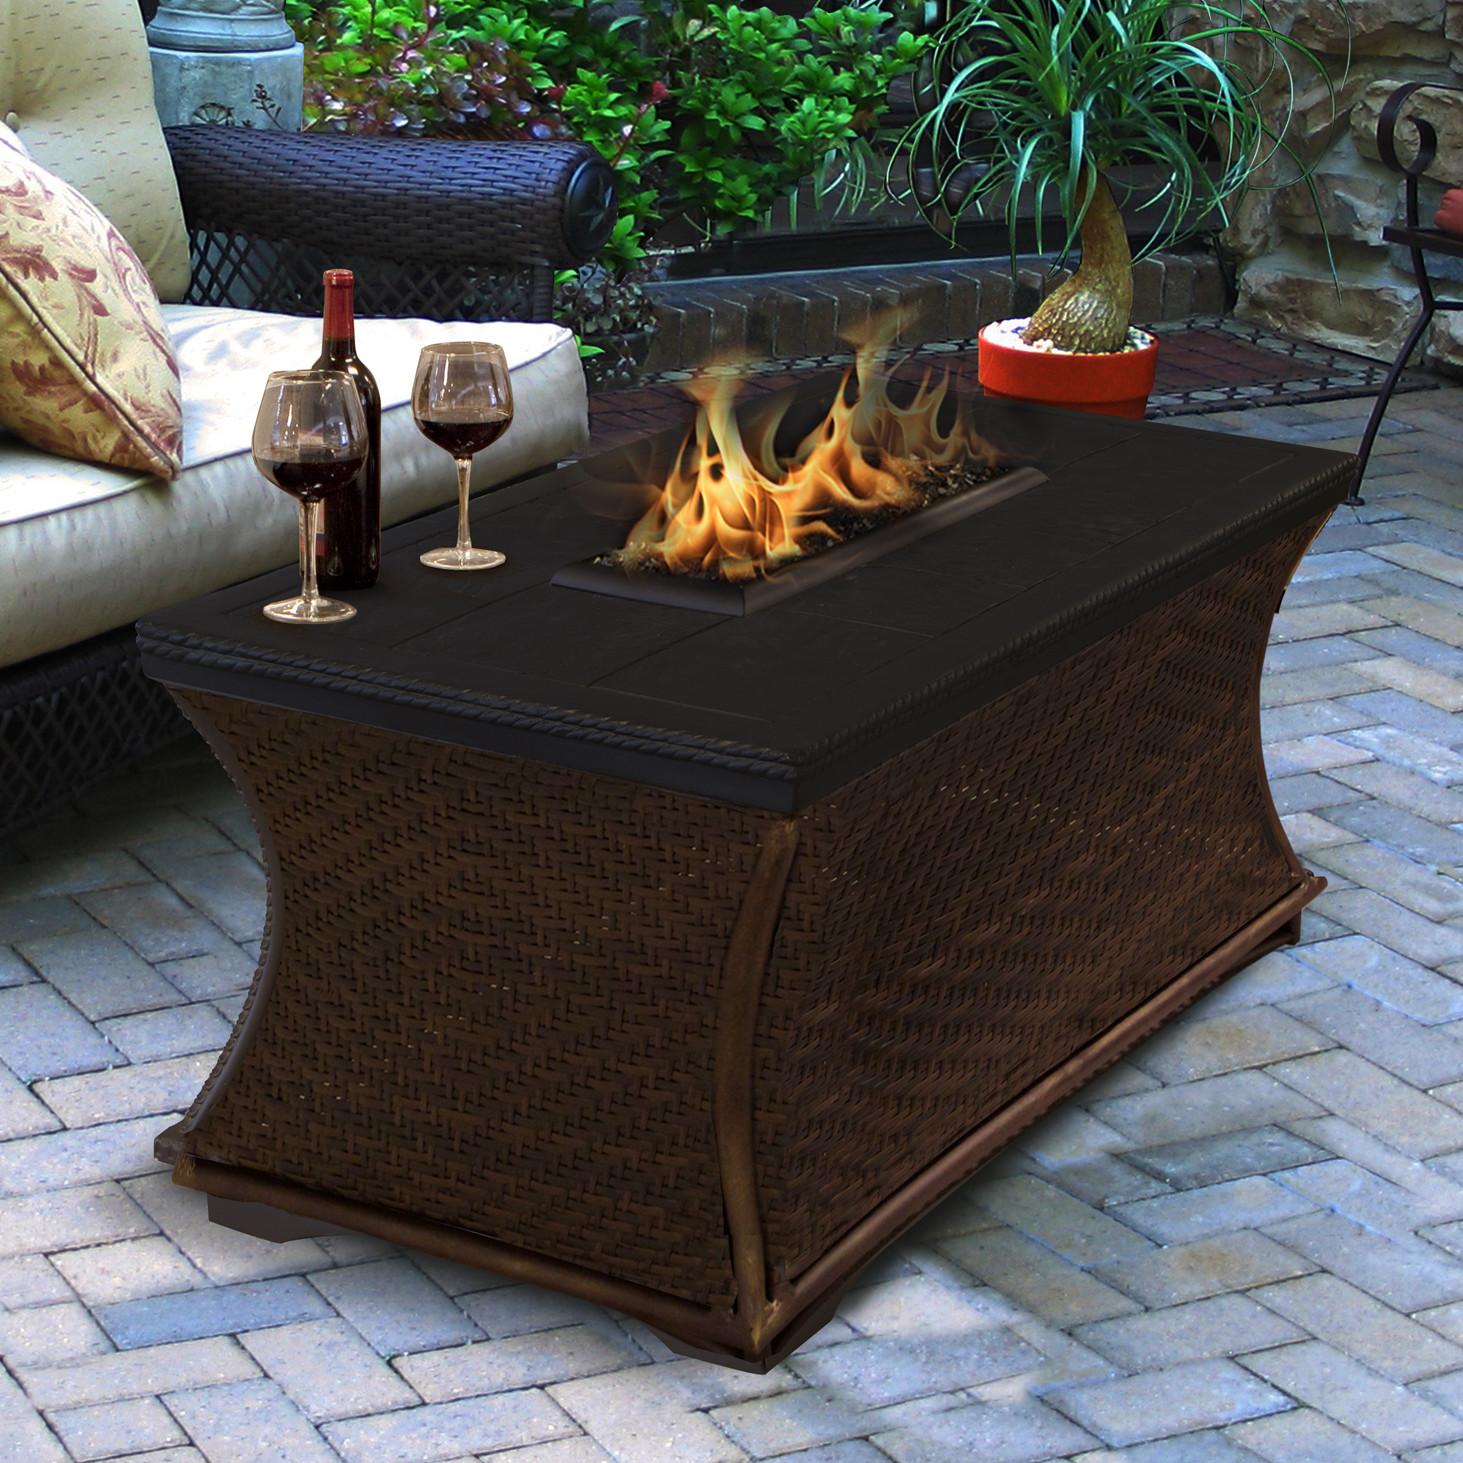 mendocino-propane-fire-pit-table